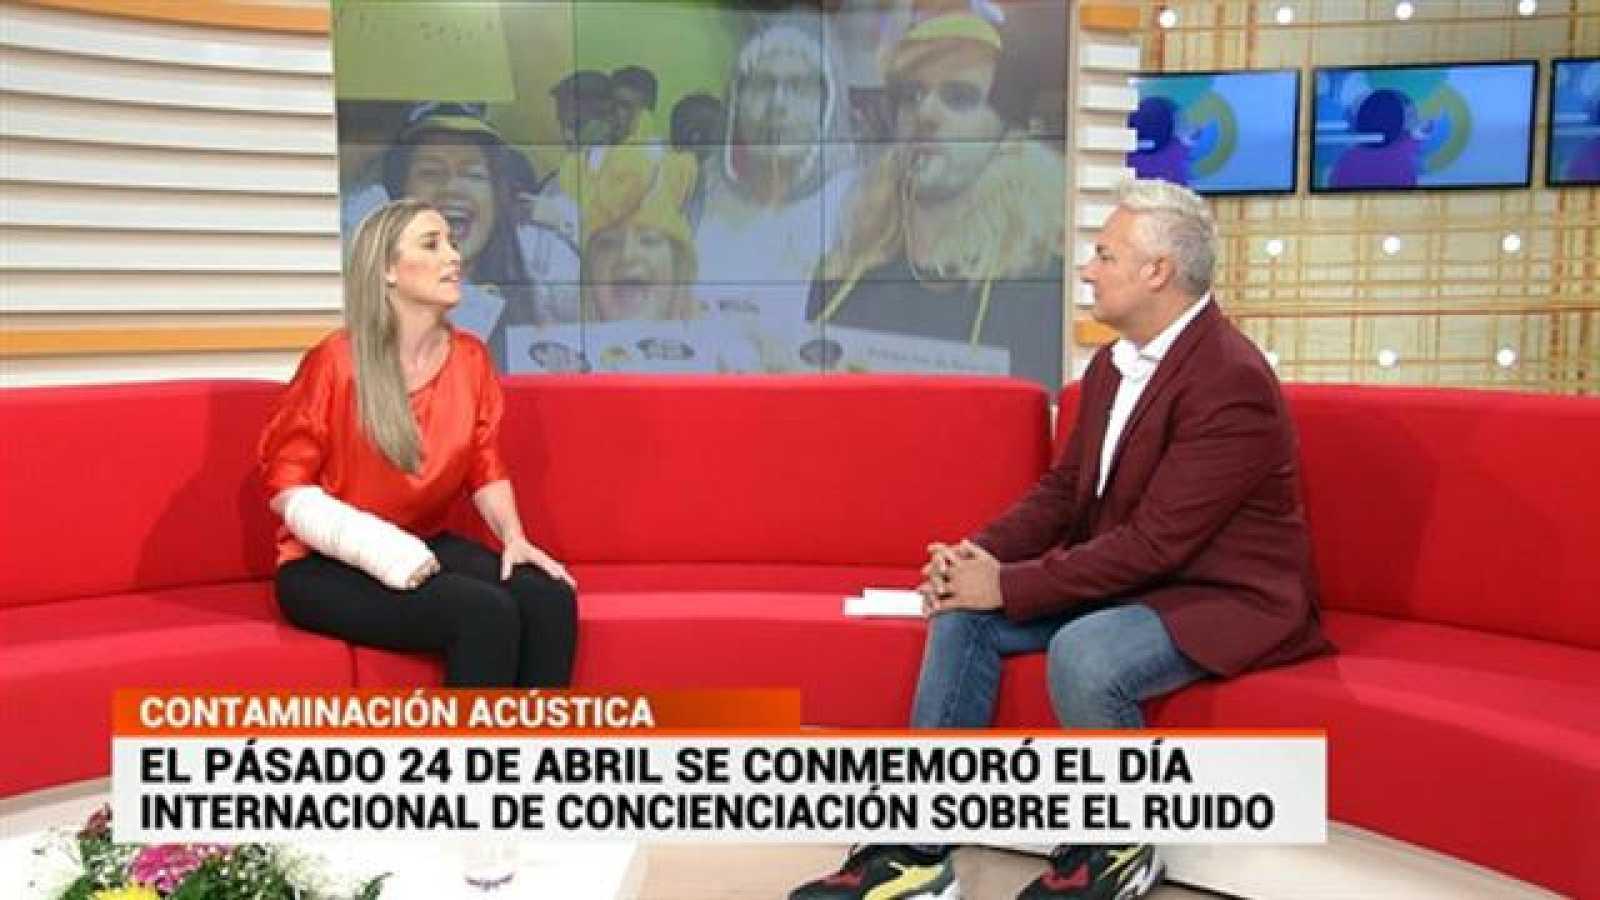 Cerca de ti - 29/04/2019 :: rtve.es